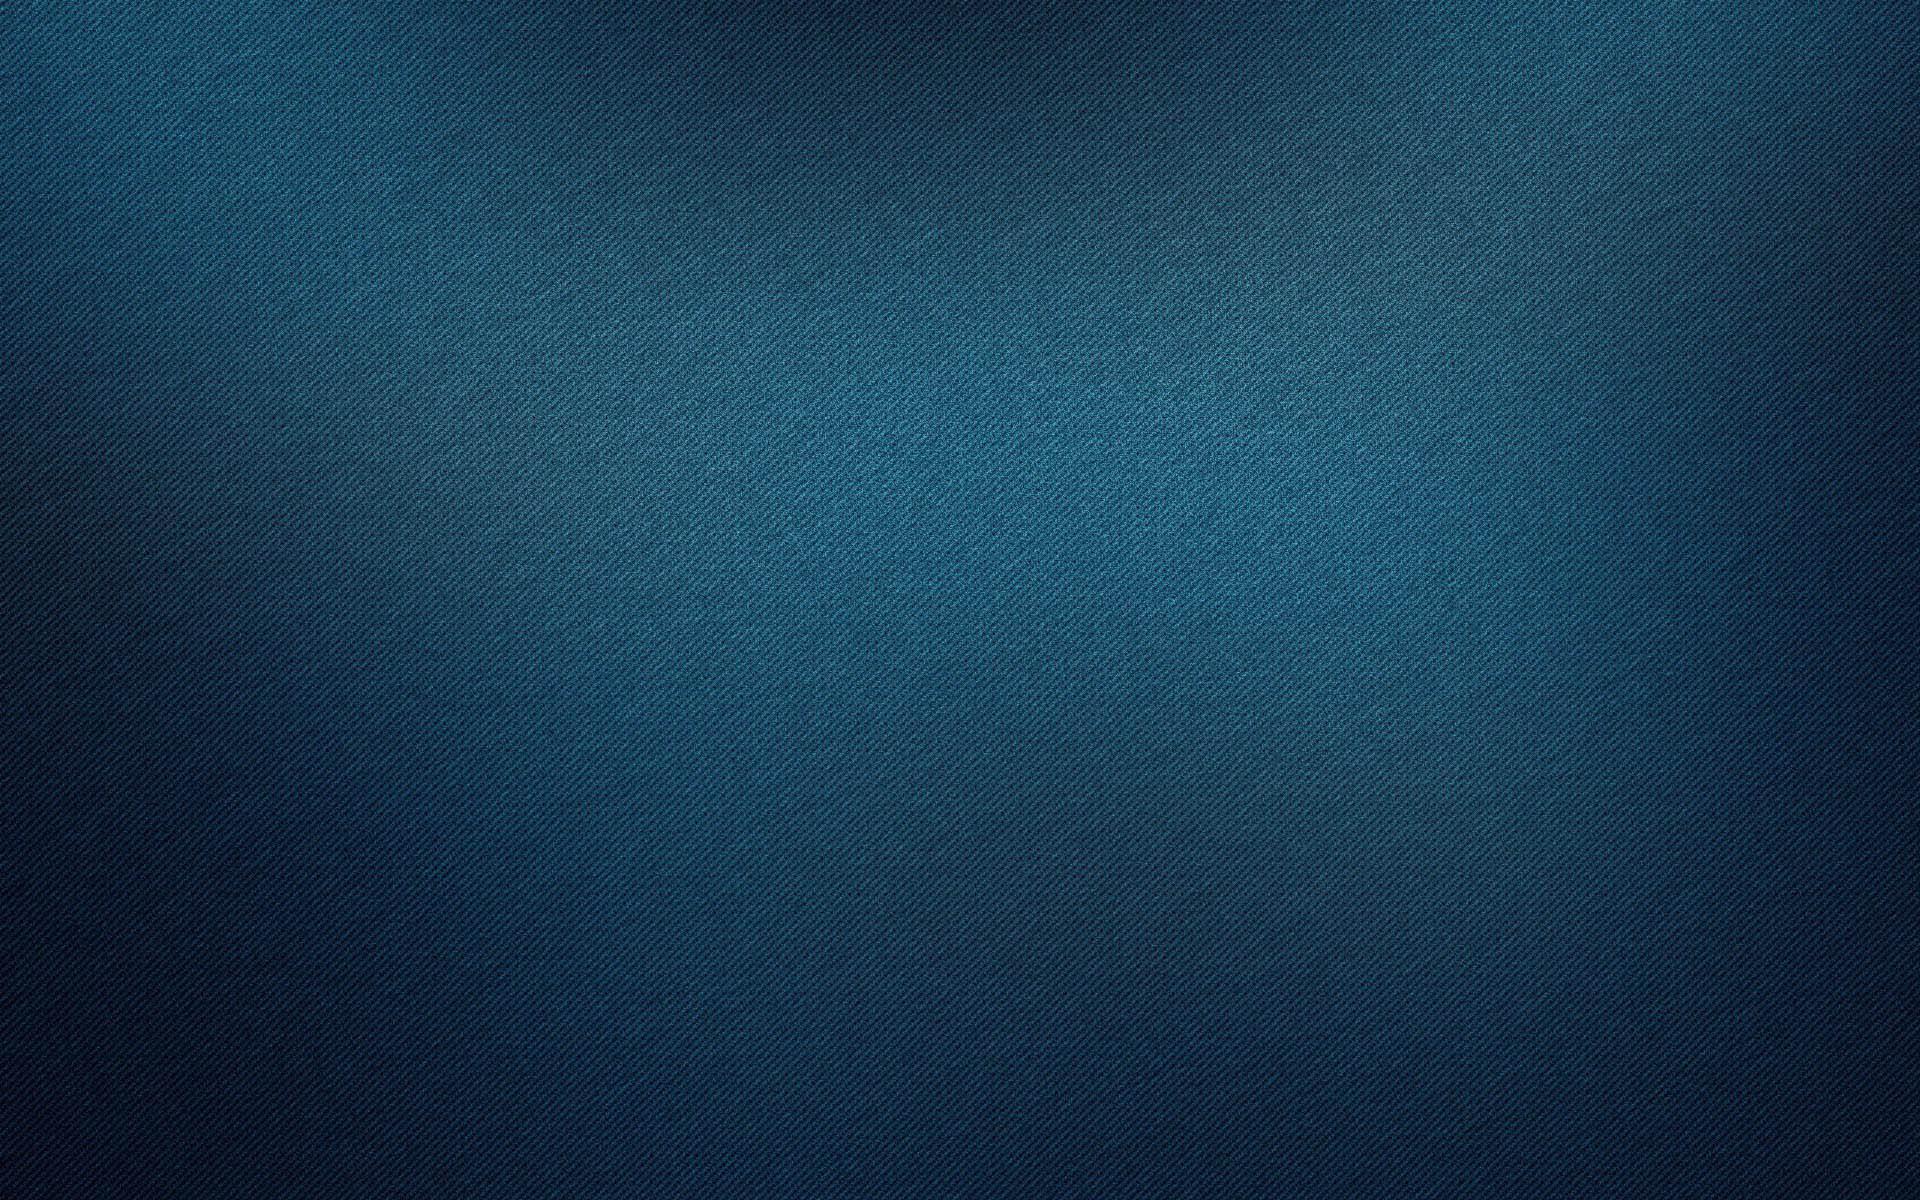 Dark Blue Background Images Wallpapertag: Обои ткань, синий, Background, текстура, Фон, Blue, джинс